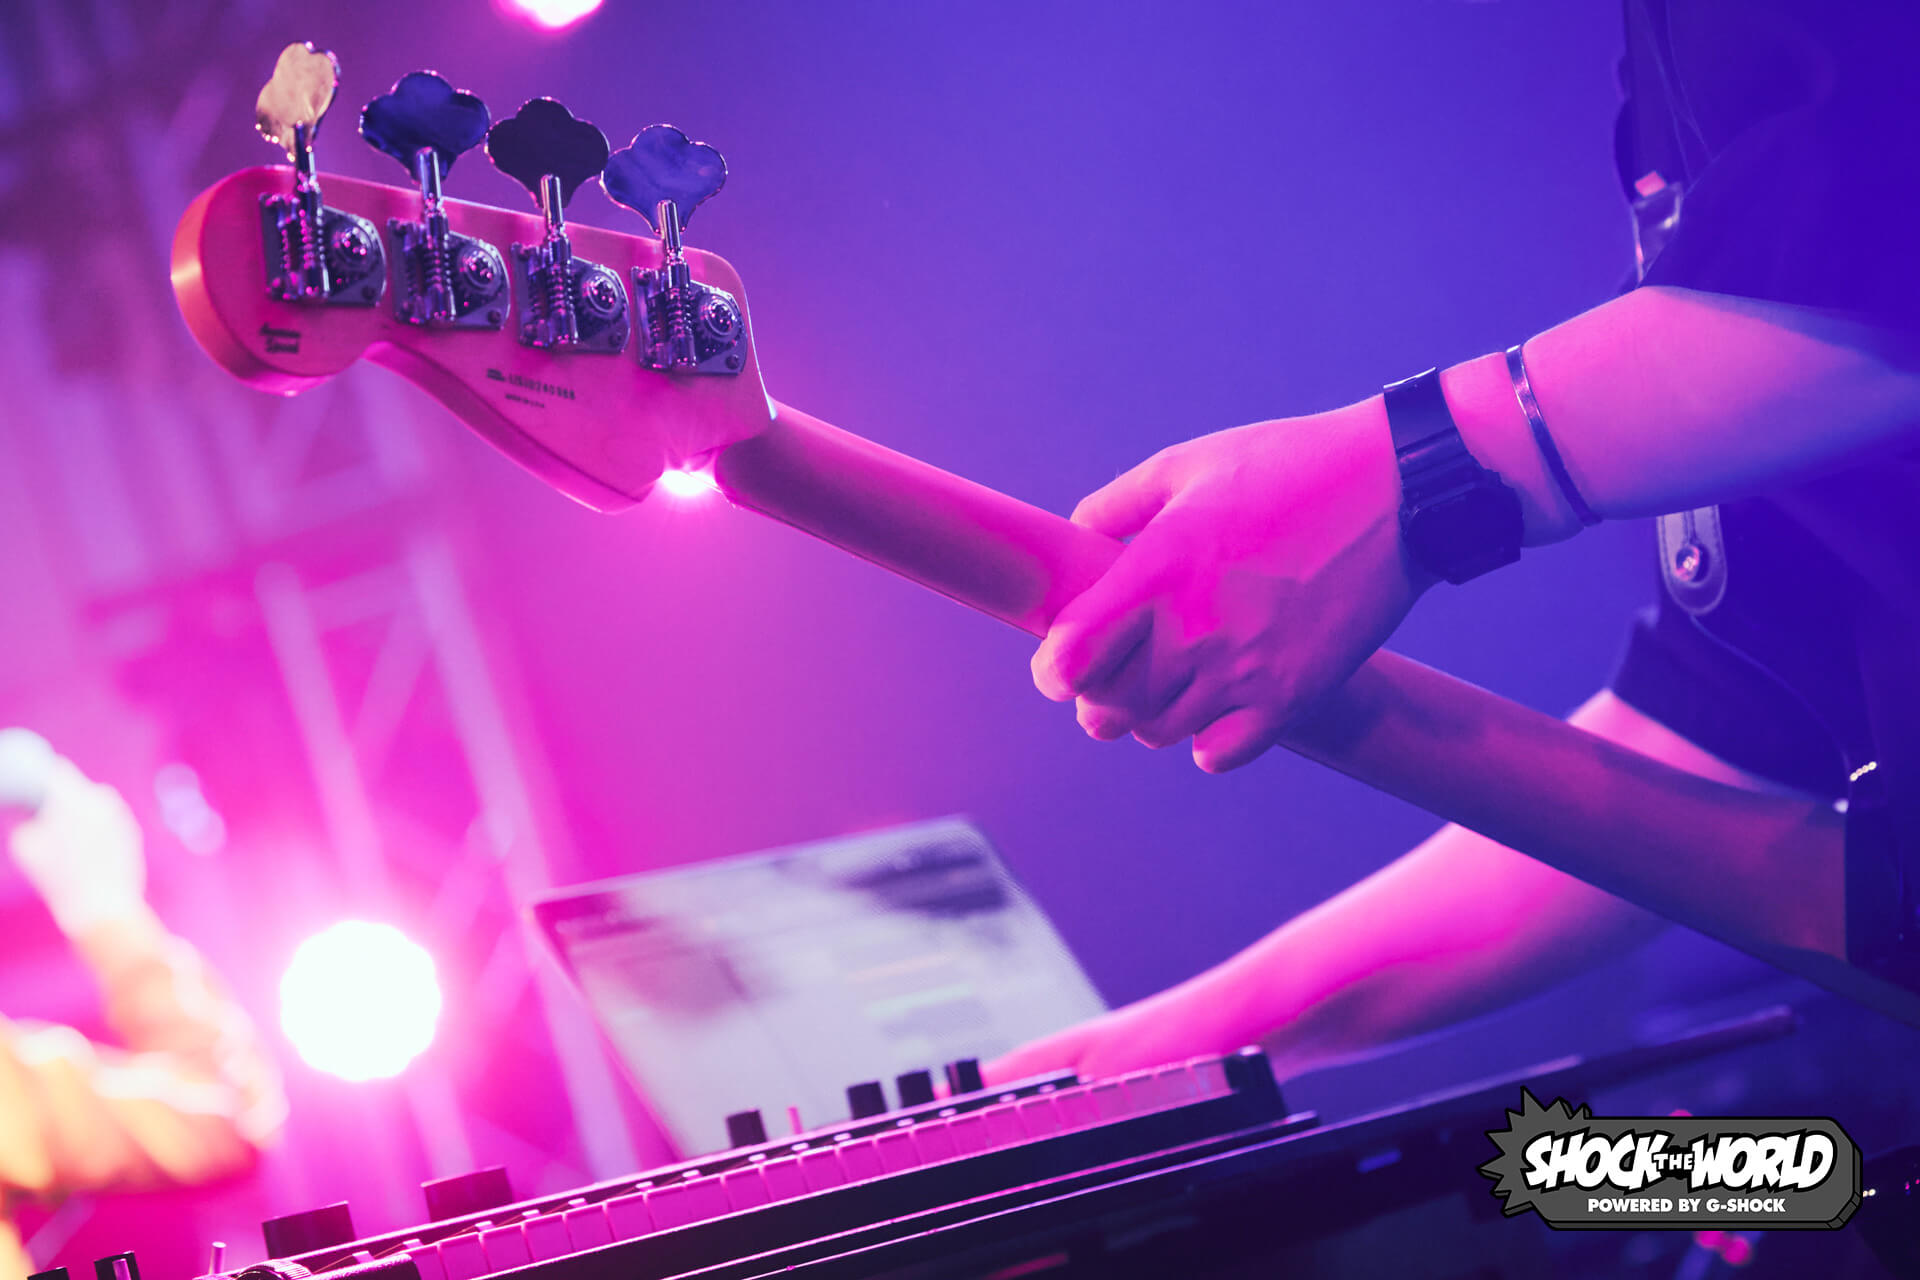 G-SHOCK『SHOCK THE WORLD』第6弾で80KIDZ、あっこゴリラ、YonYonのトーク&ライブセッションが実現! music210804_shocktheworld_2